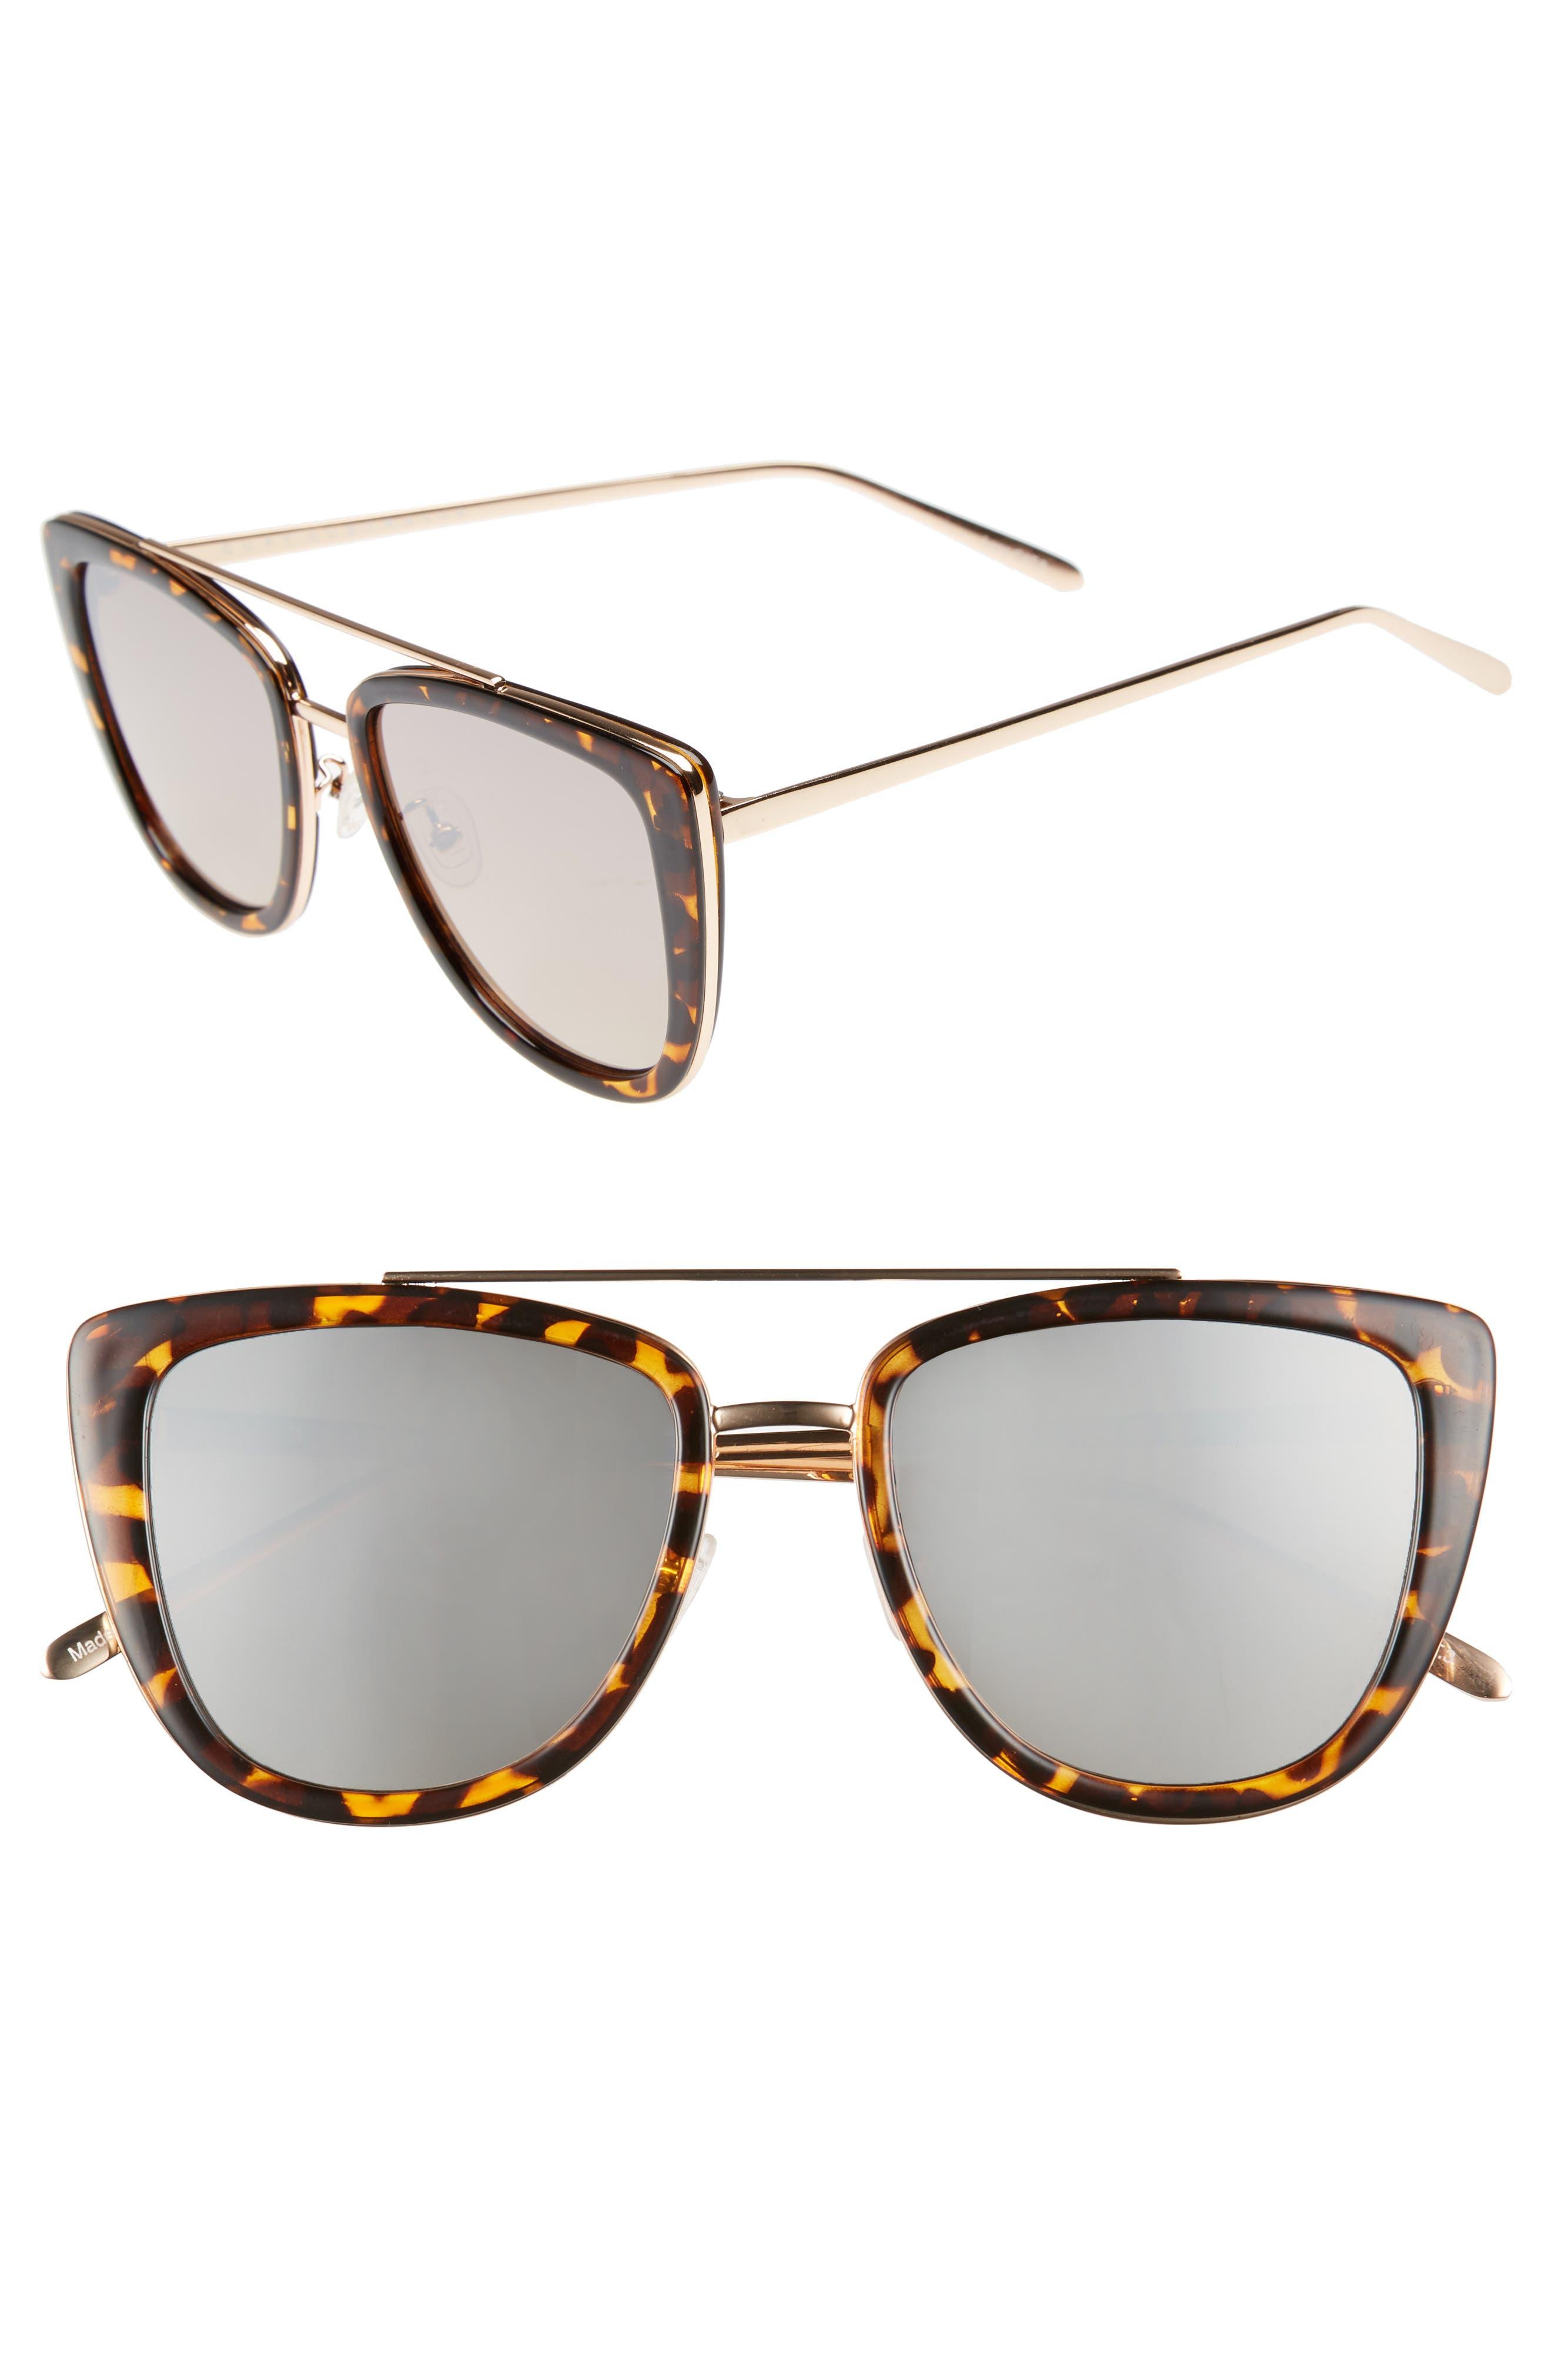 French Kiss 55mm Cat Eye Sunglasses,                             Main thumbnail 1, color,                             200